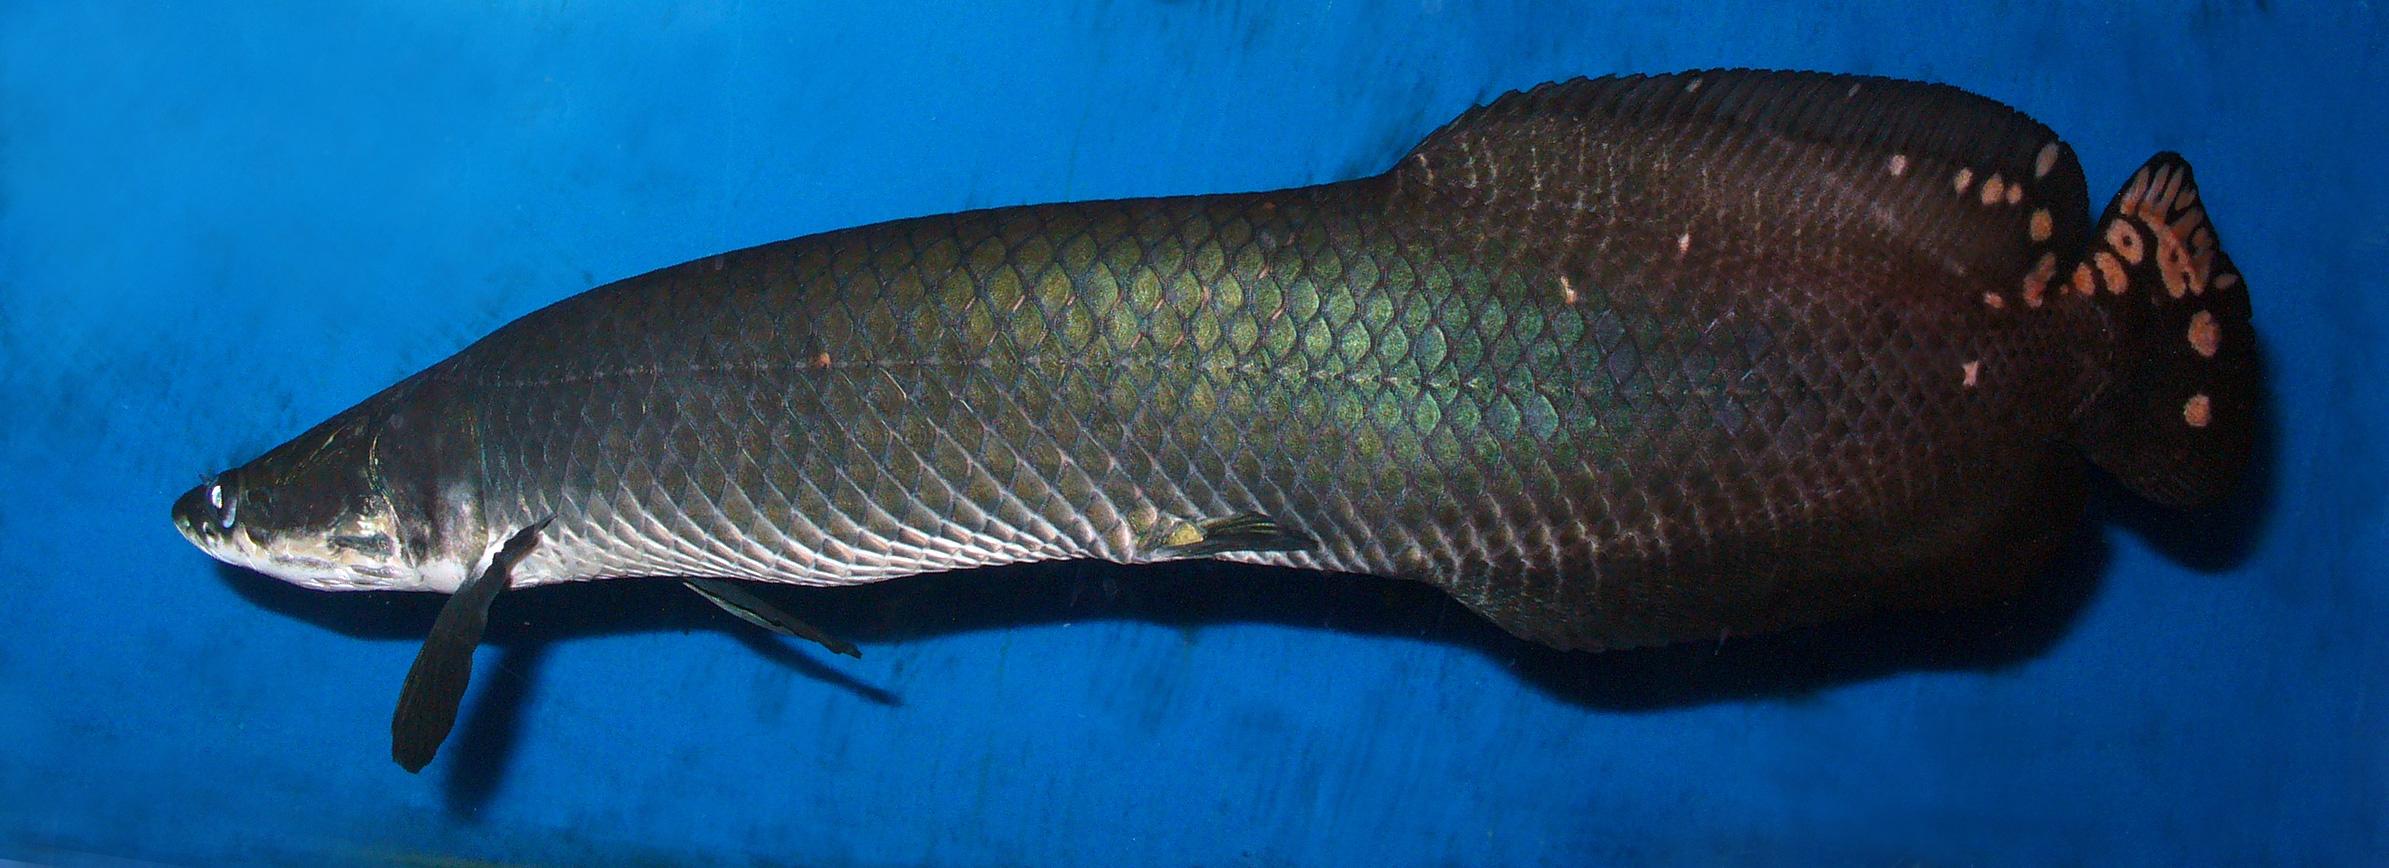 File:Arapaima leptosoma 2009 G2.jpg - Wikimedia Commons